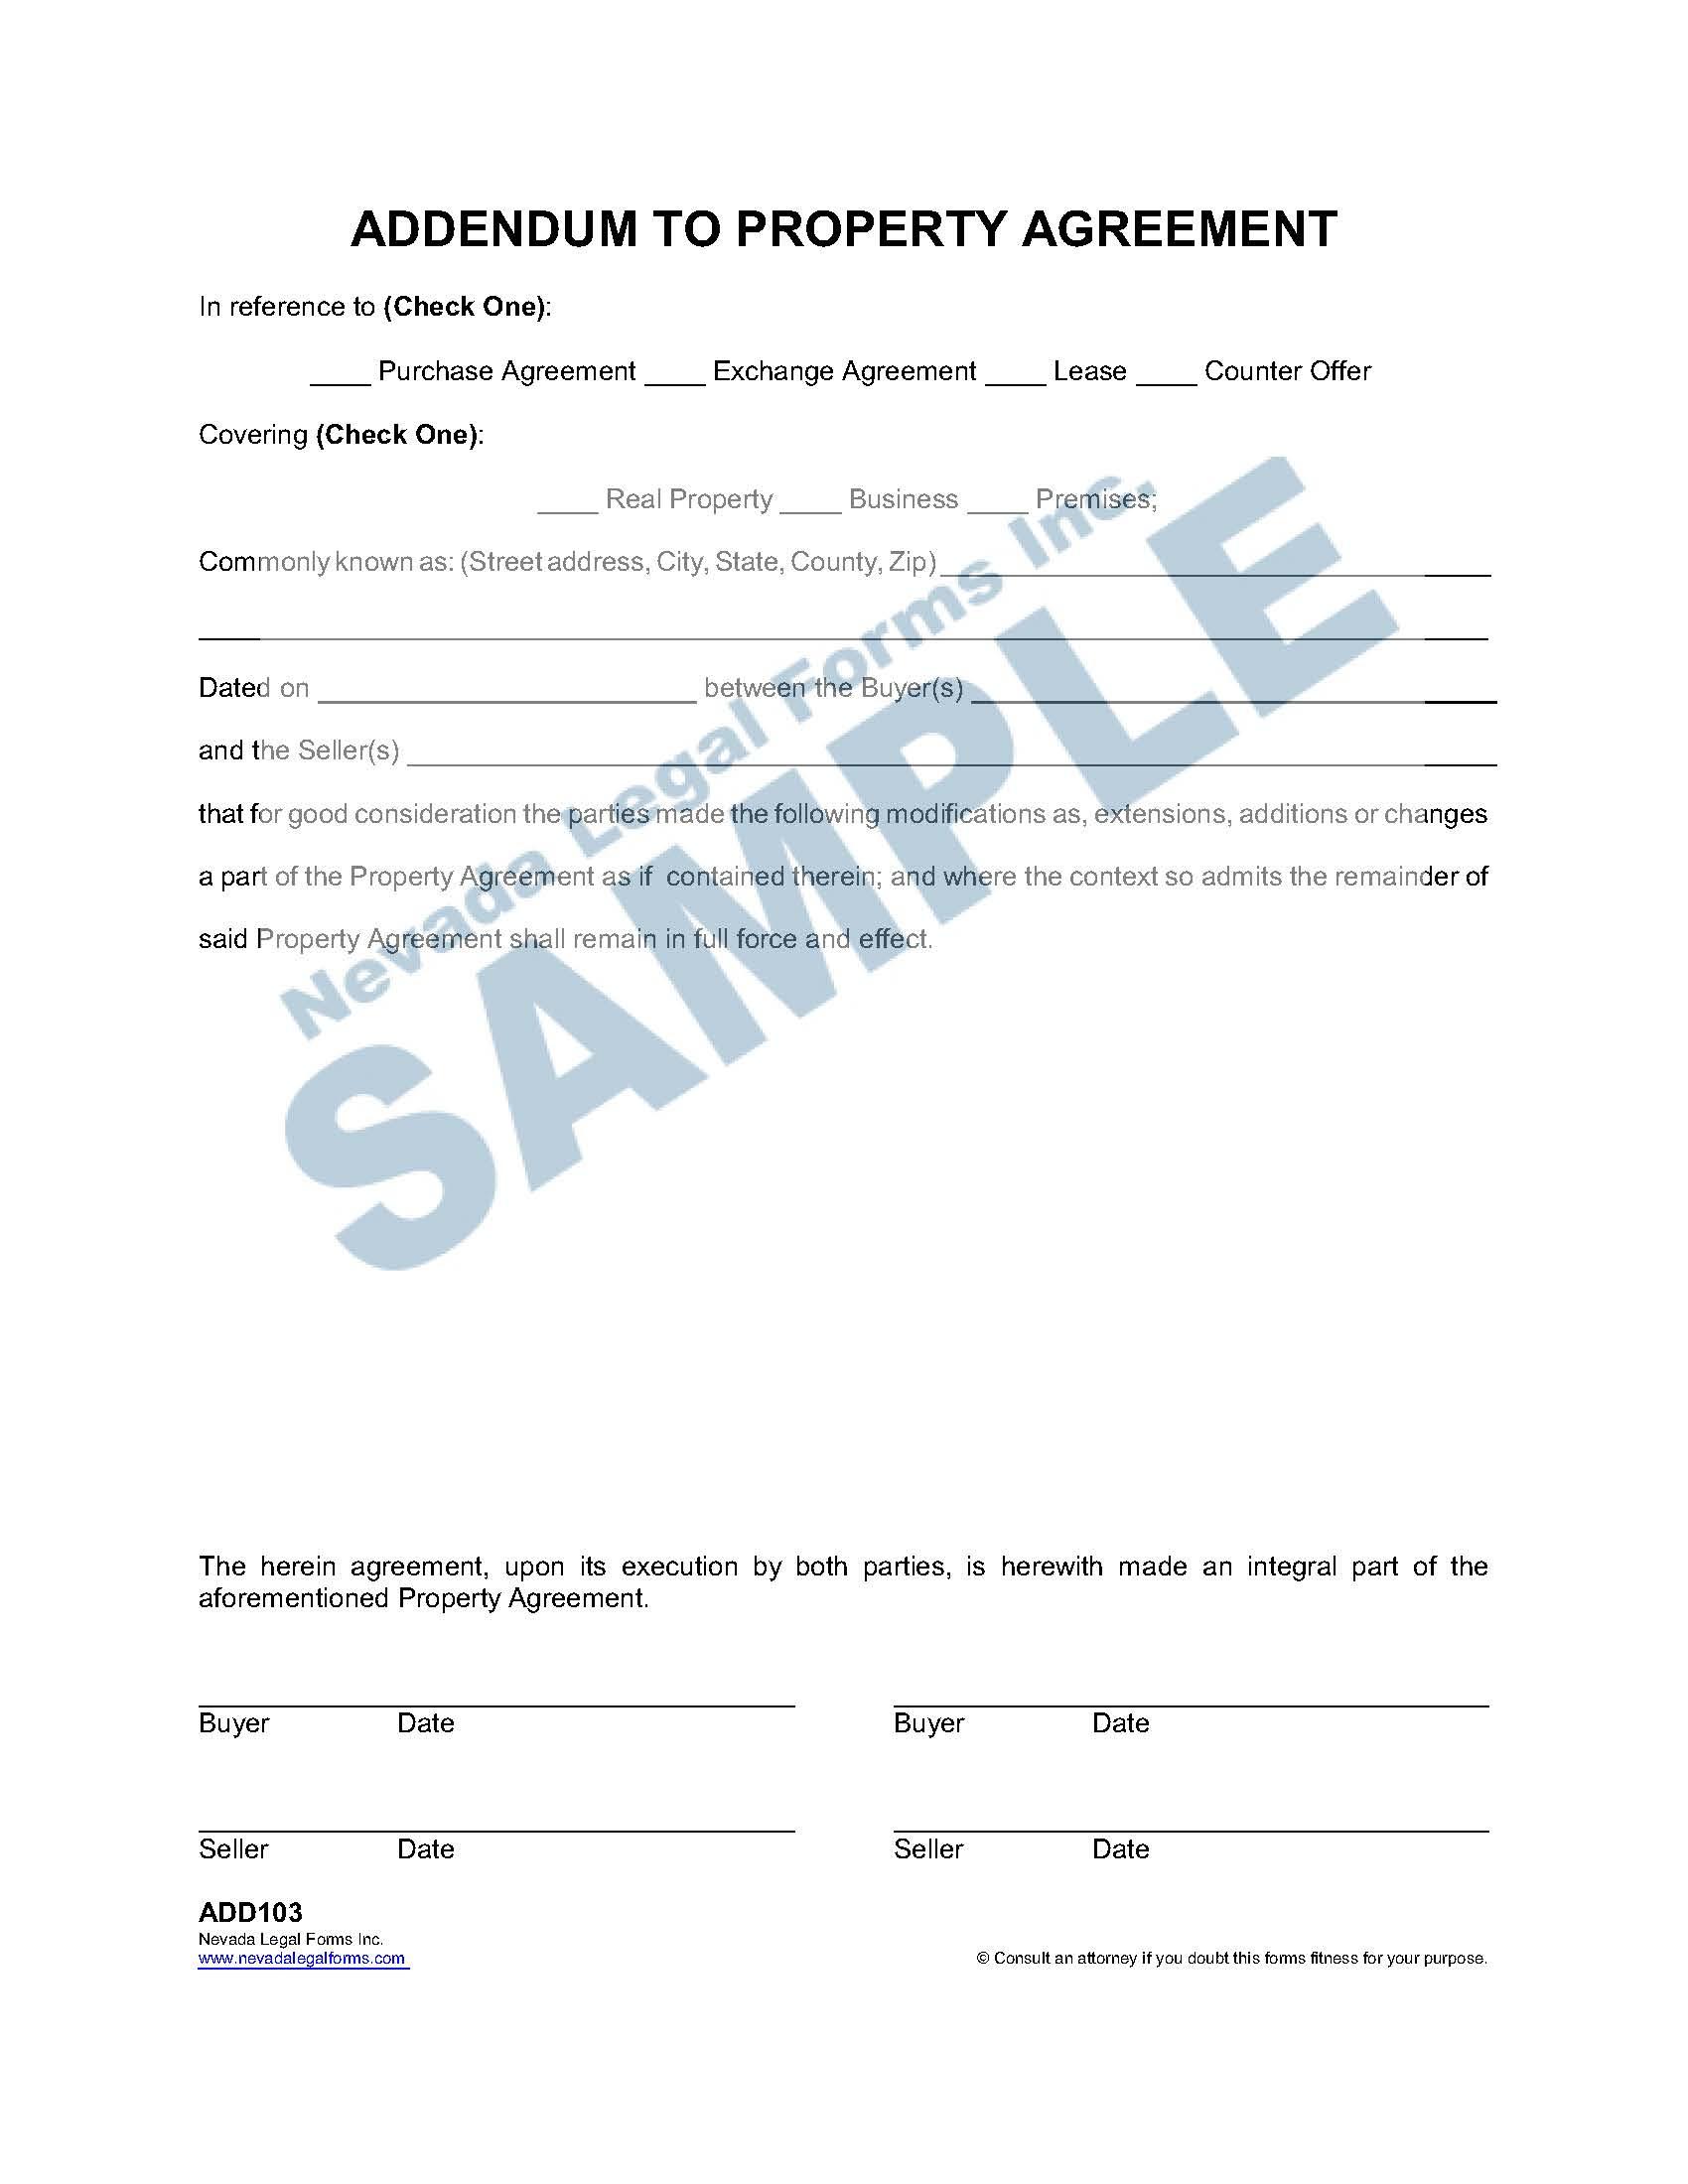 Addendum To Property Agreement